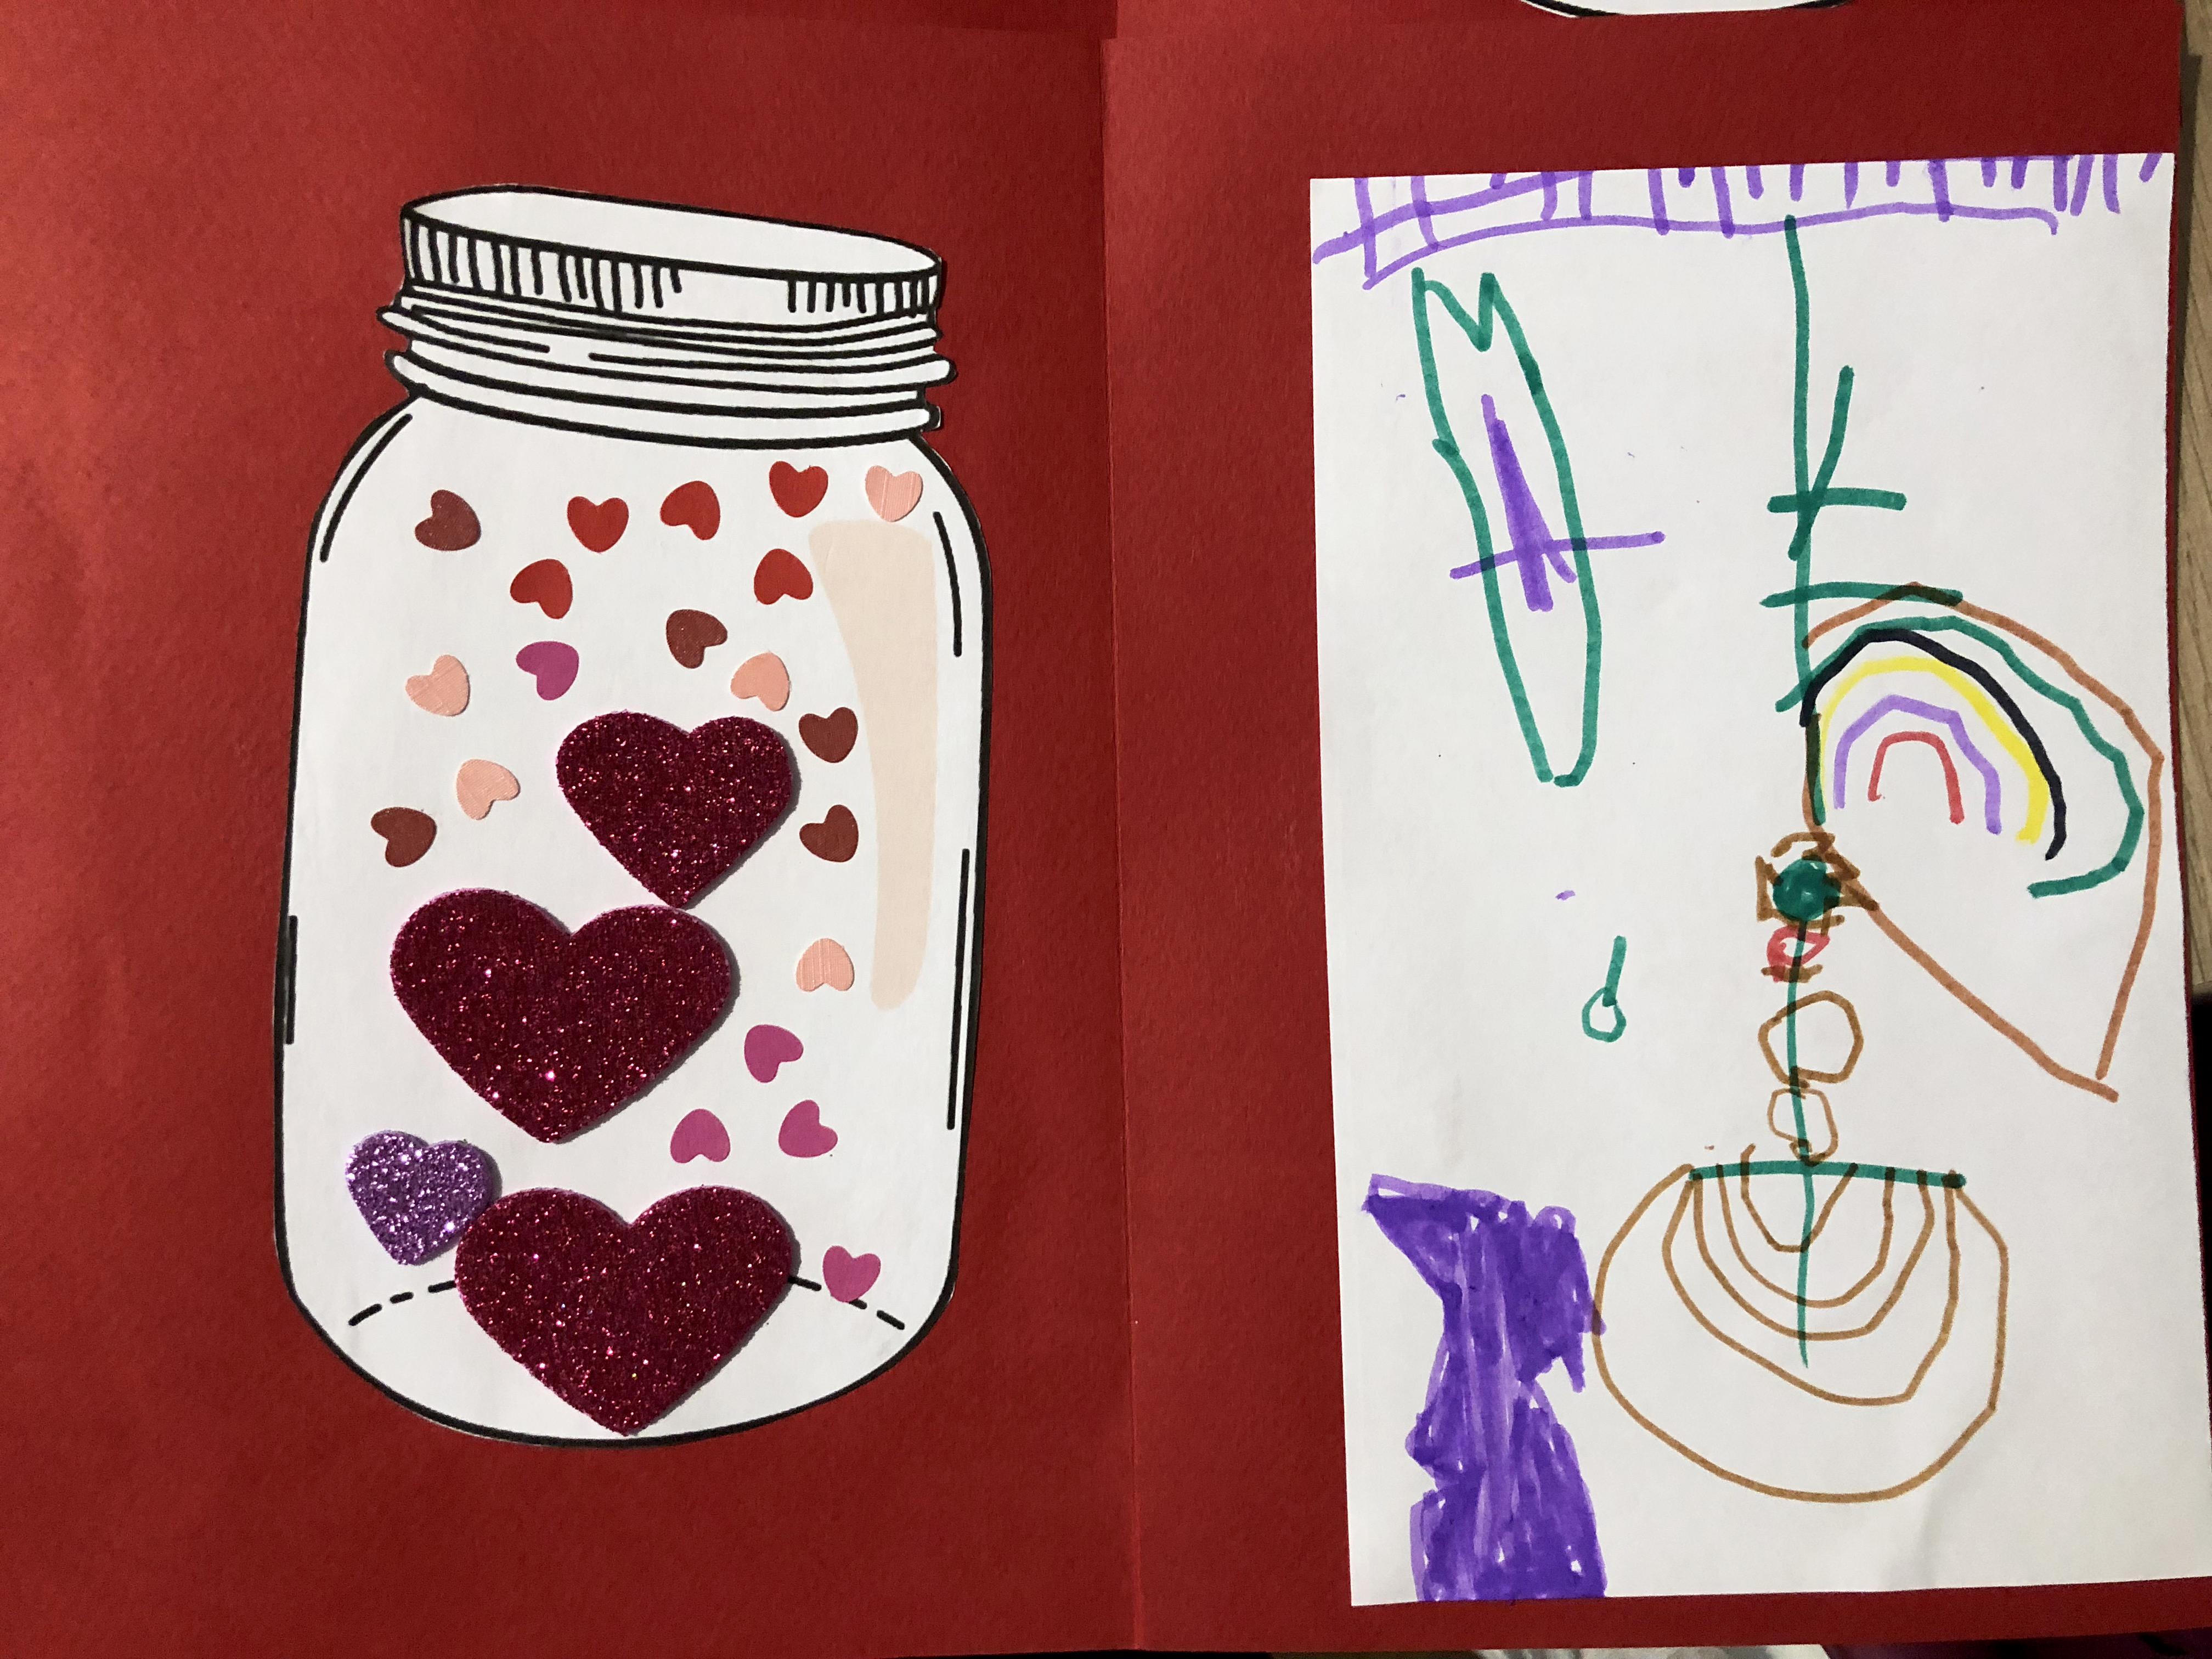 saint-valentin carte diy amour coeur